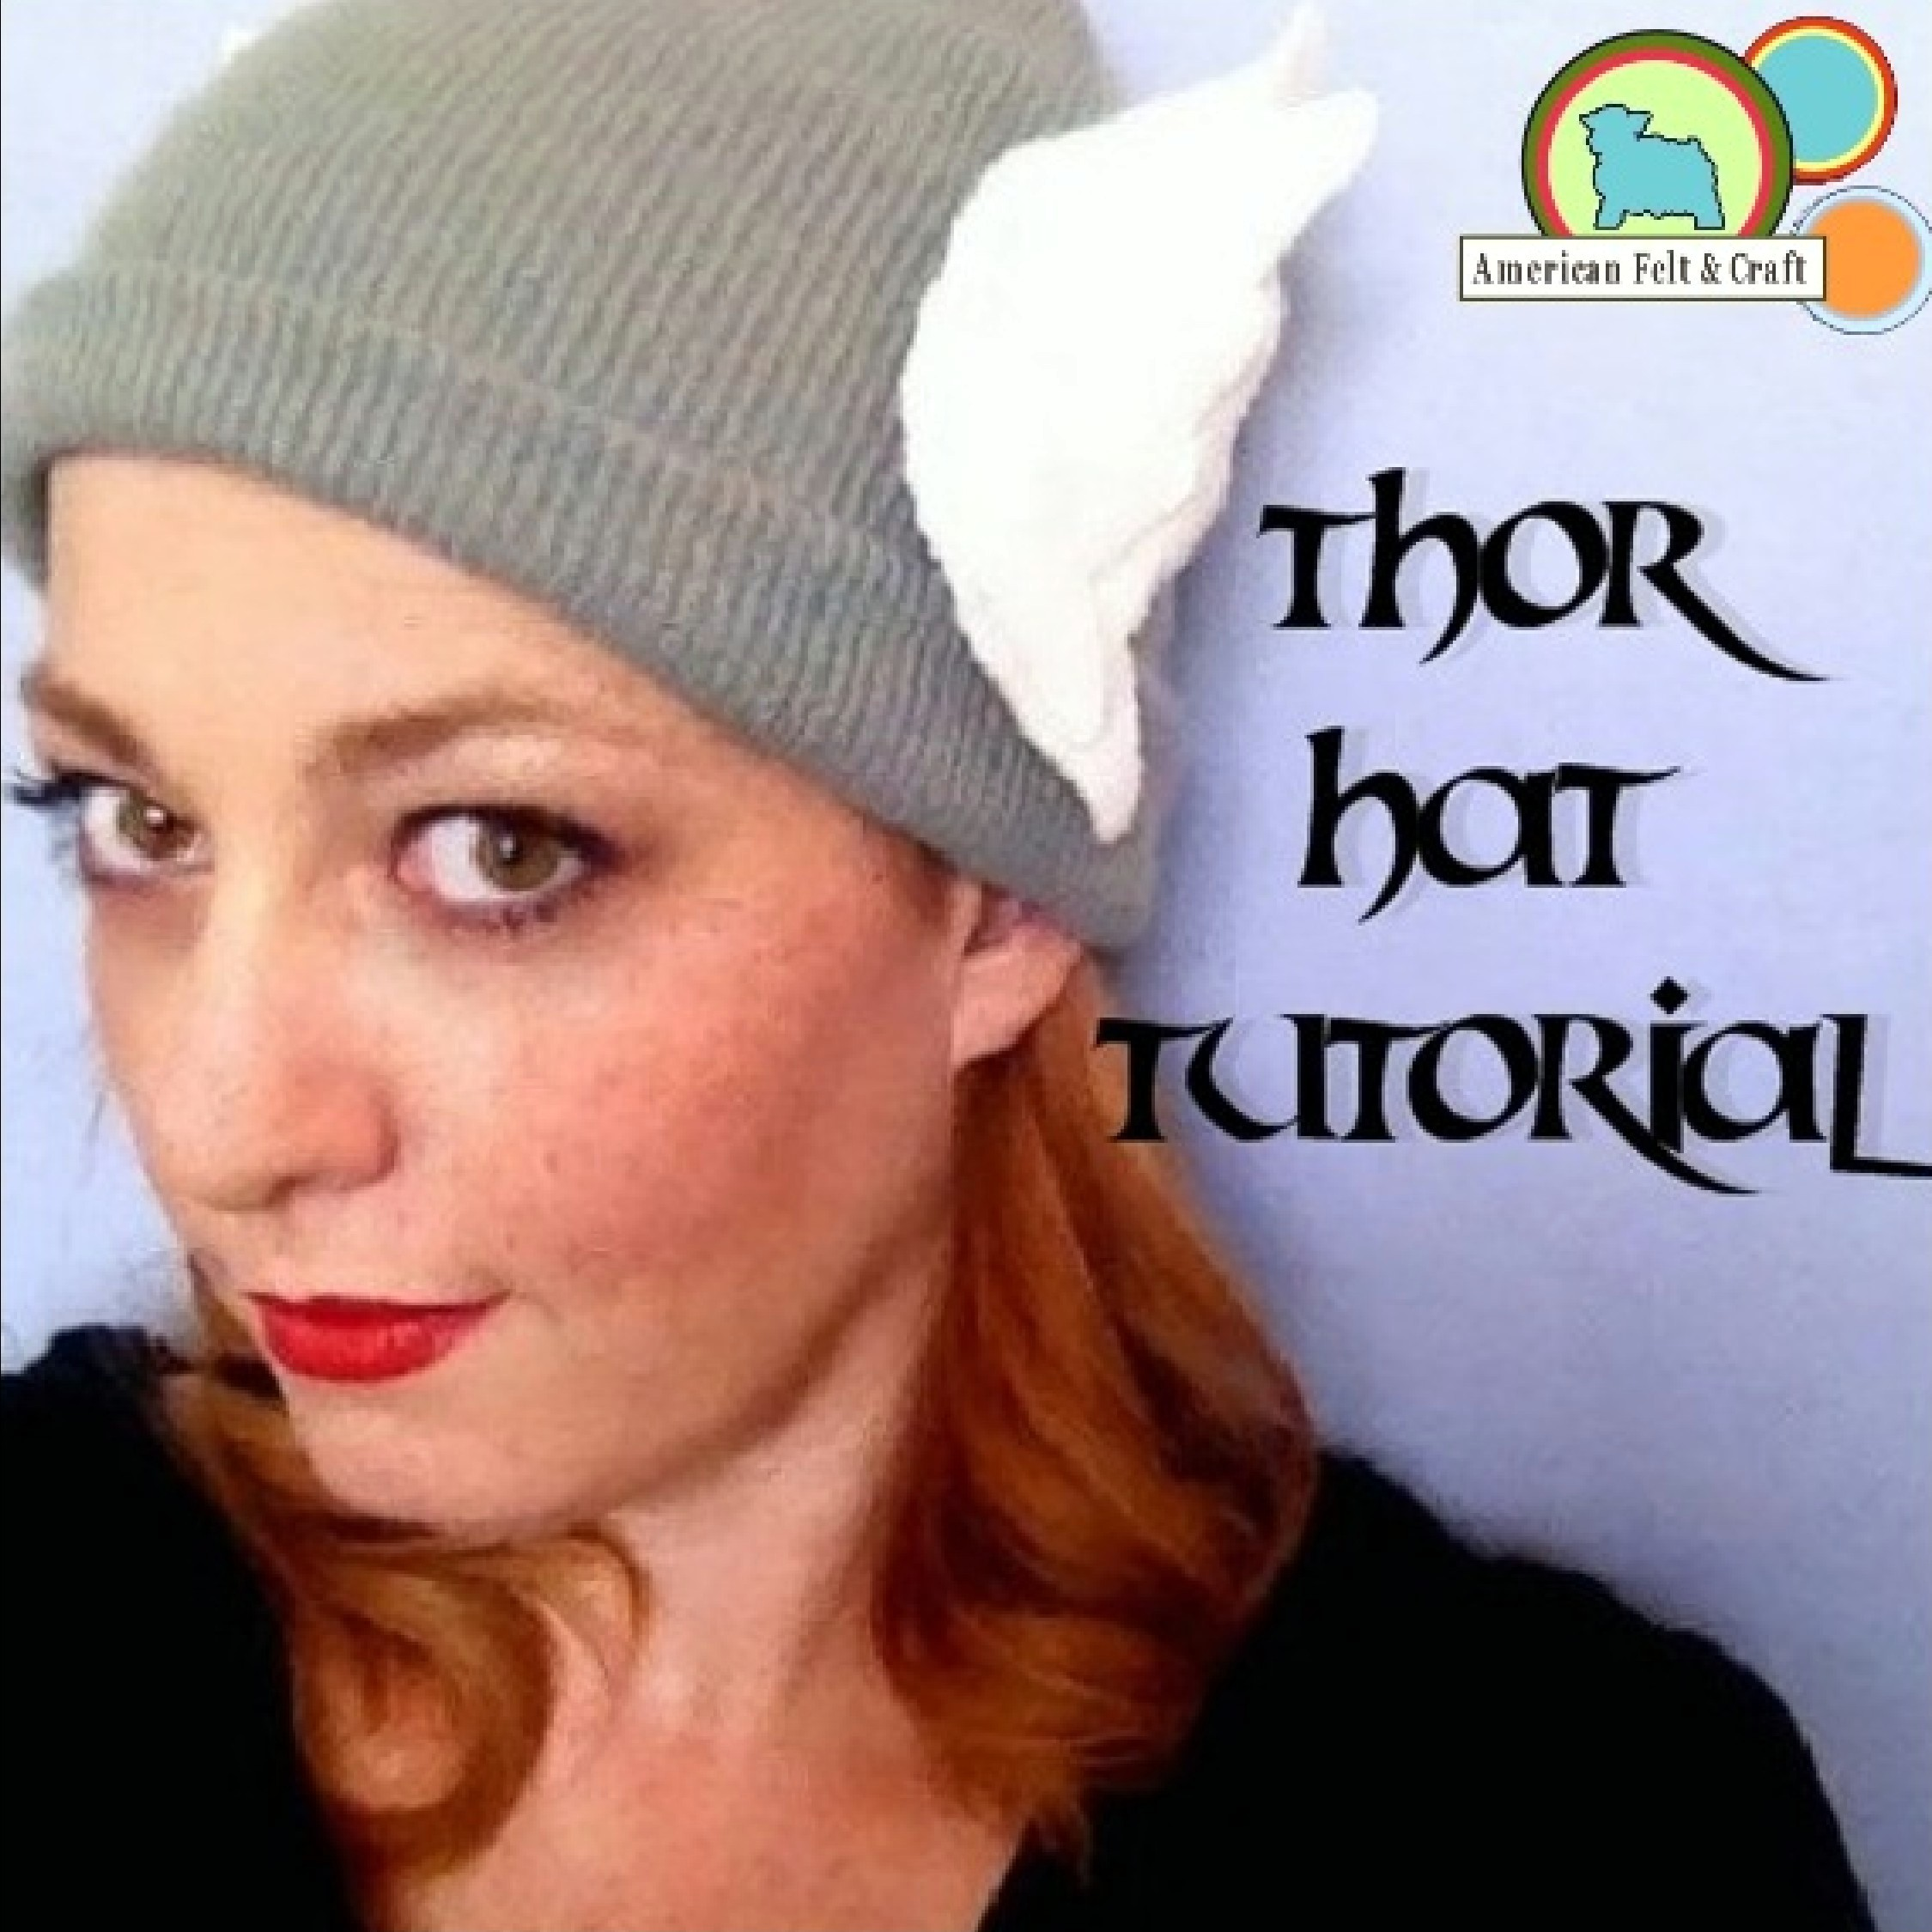 Thor Inspired Viking Helmet Hat | ~American Felt & Craft ~ Blog